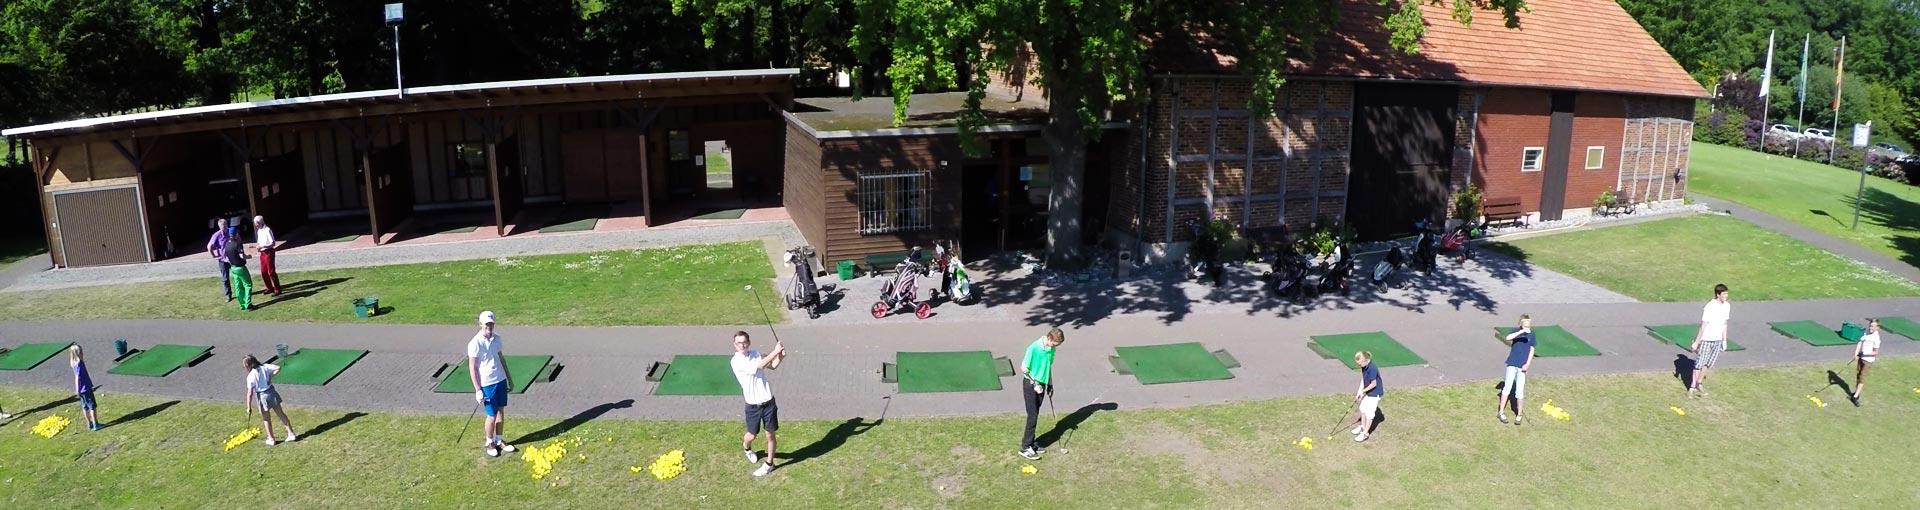 golfplatz_3